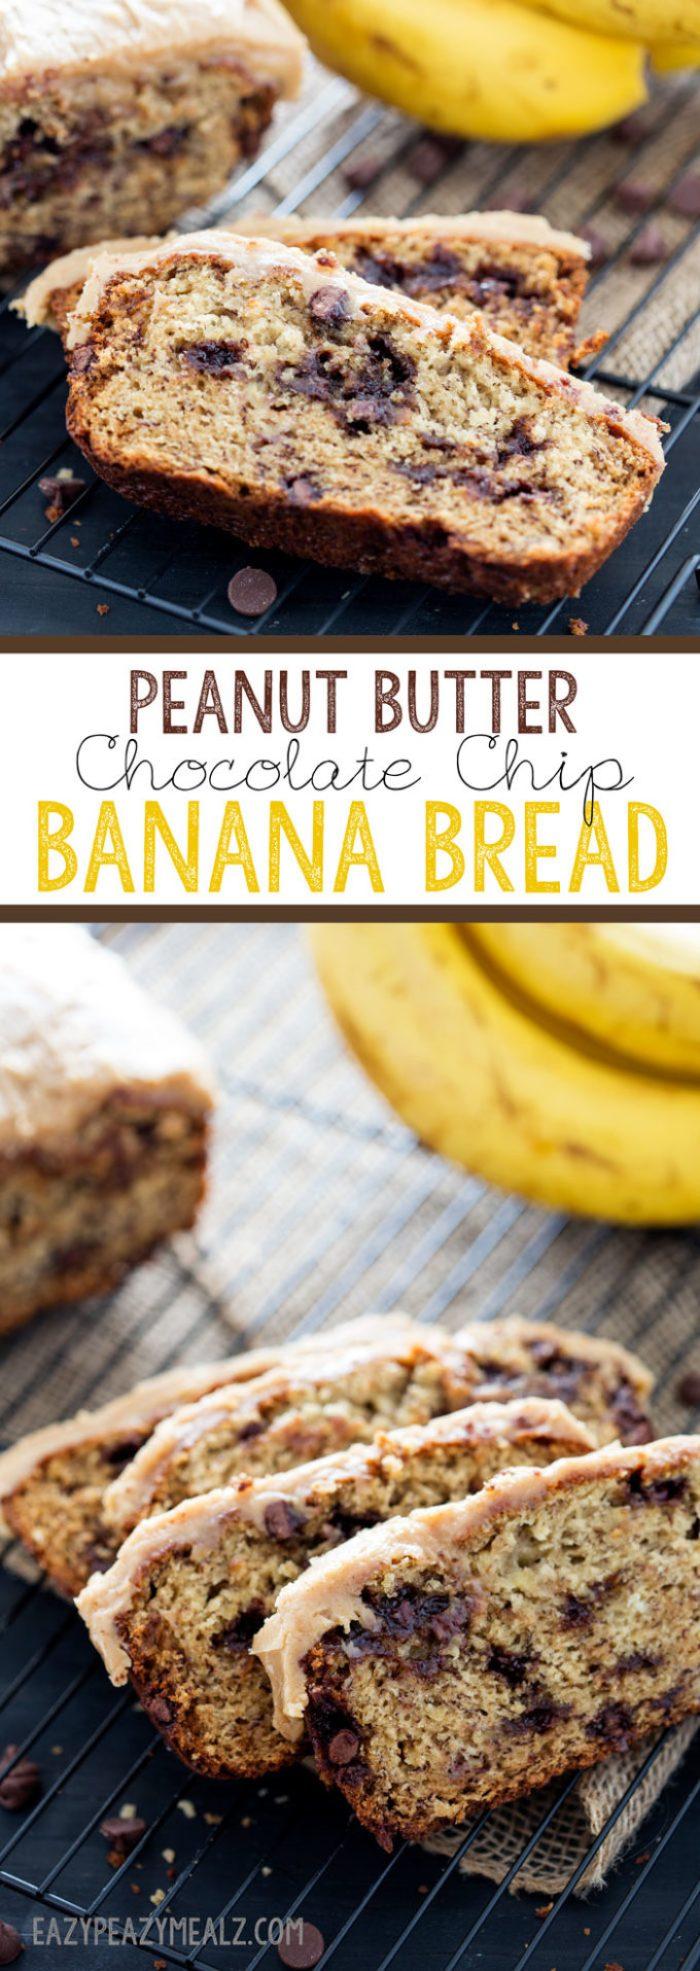 PB-banana-bread-PIN